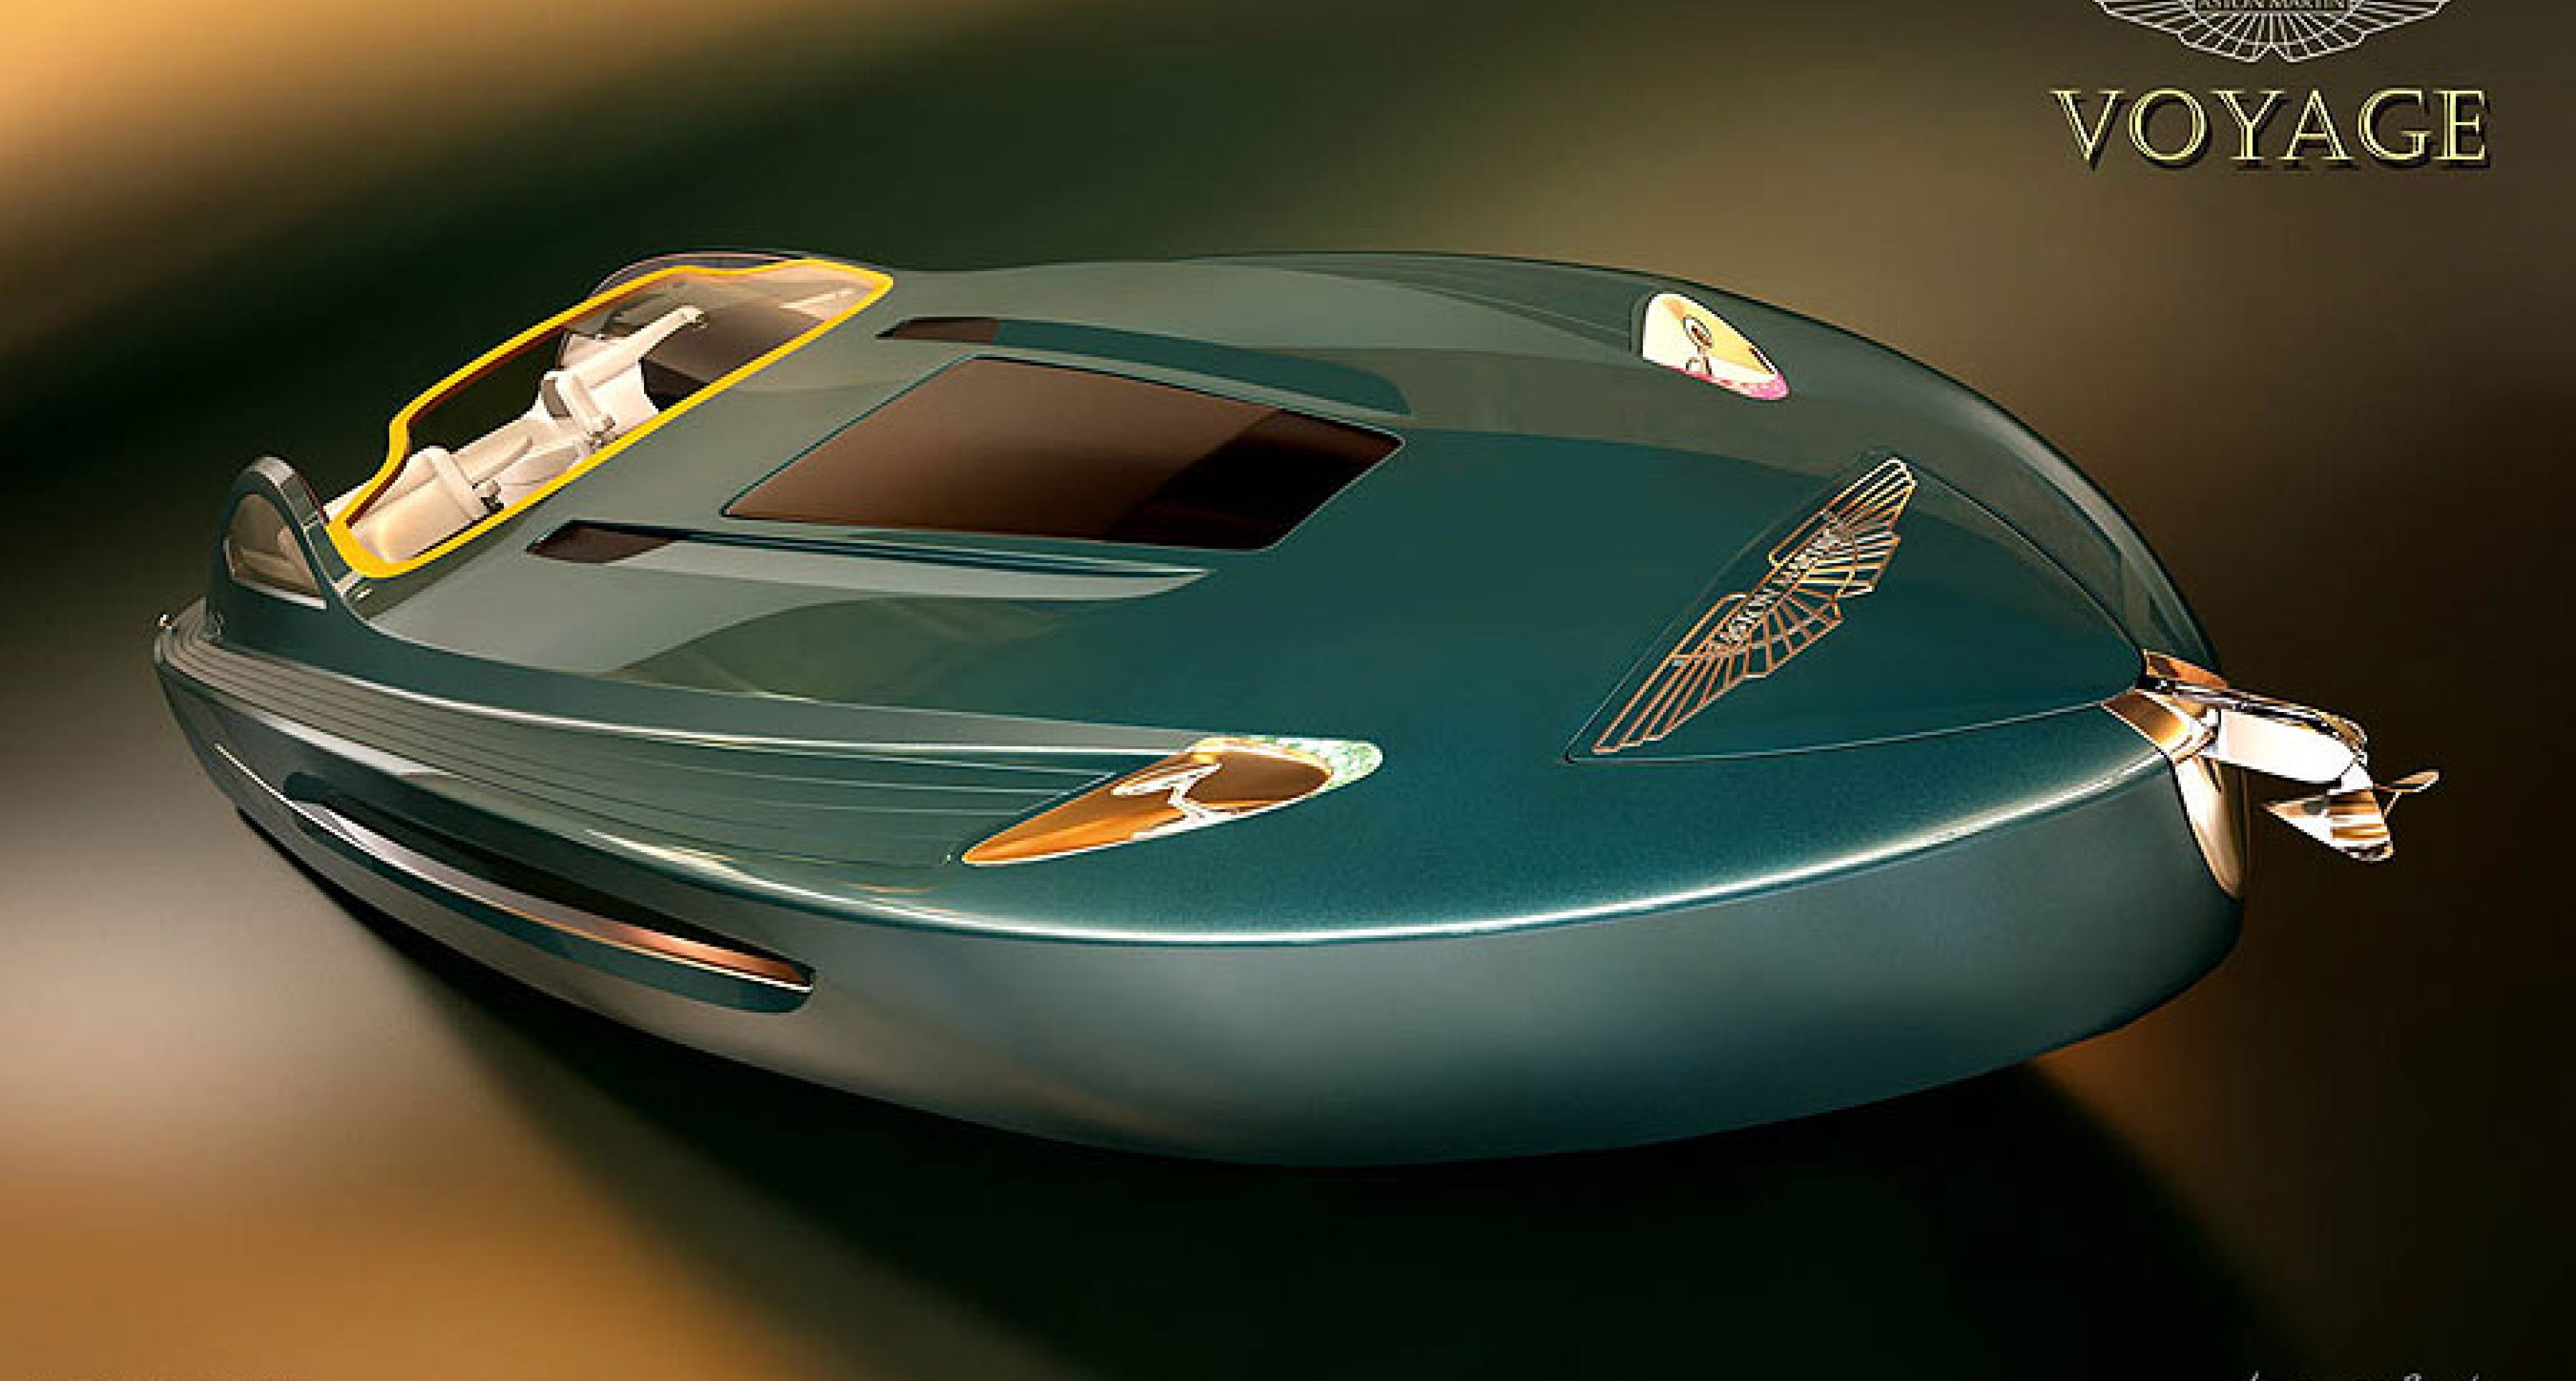 Aston Martin Voyage Aston Marine Classic Driver Magazine - Aston martin accessories